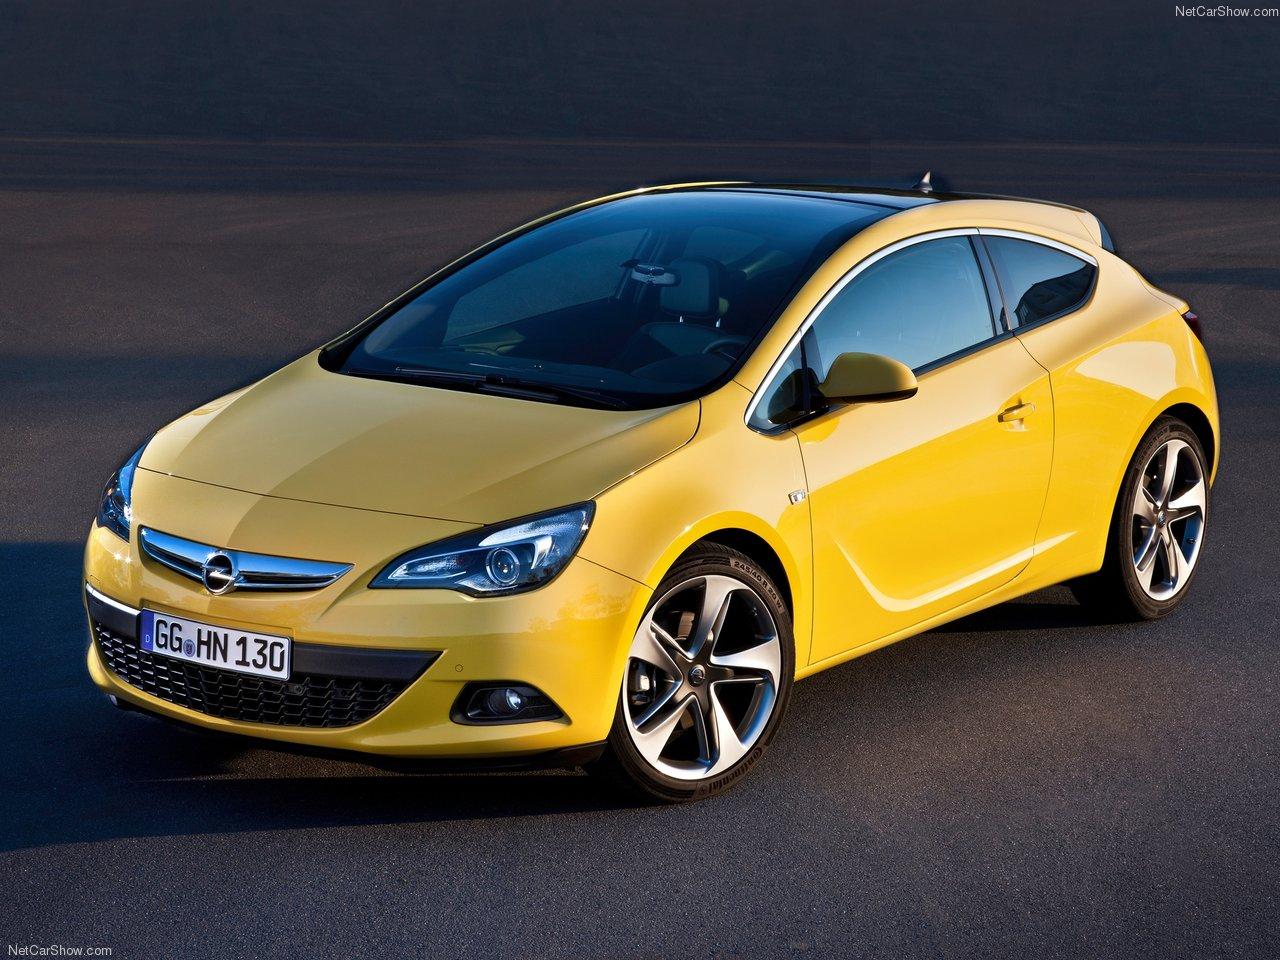 http://3.bp.blogspot.com/-1qJfwqjrDhk/T8n3EUAhuHI/AAAAAAAAAos/_PwUdDYGi3g/s1600/Opel-Astra_GTC_2012_1280x960_wallpaper_07.jpg